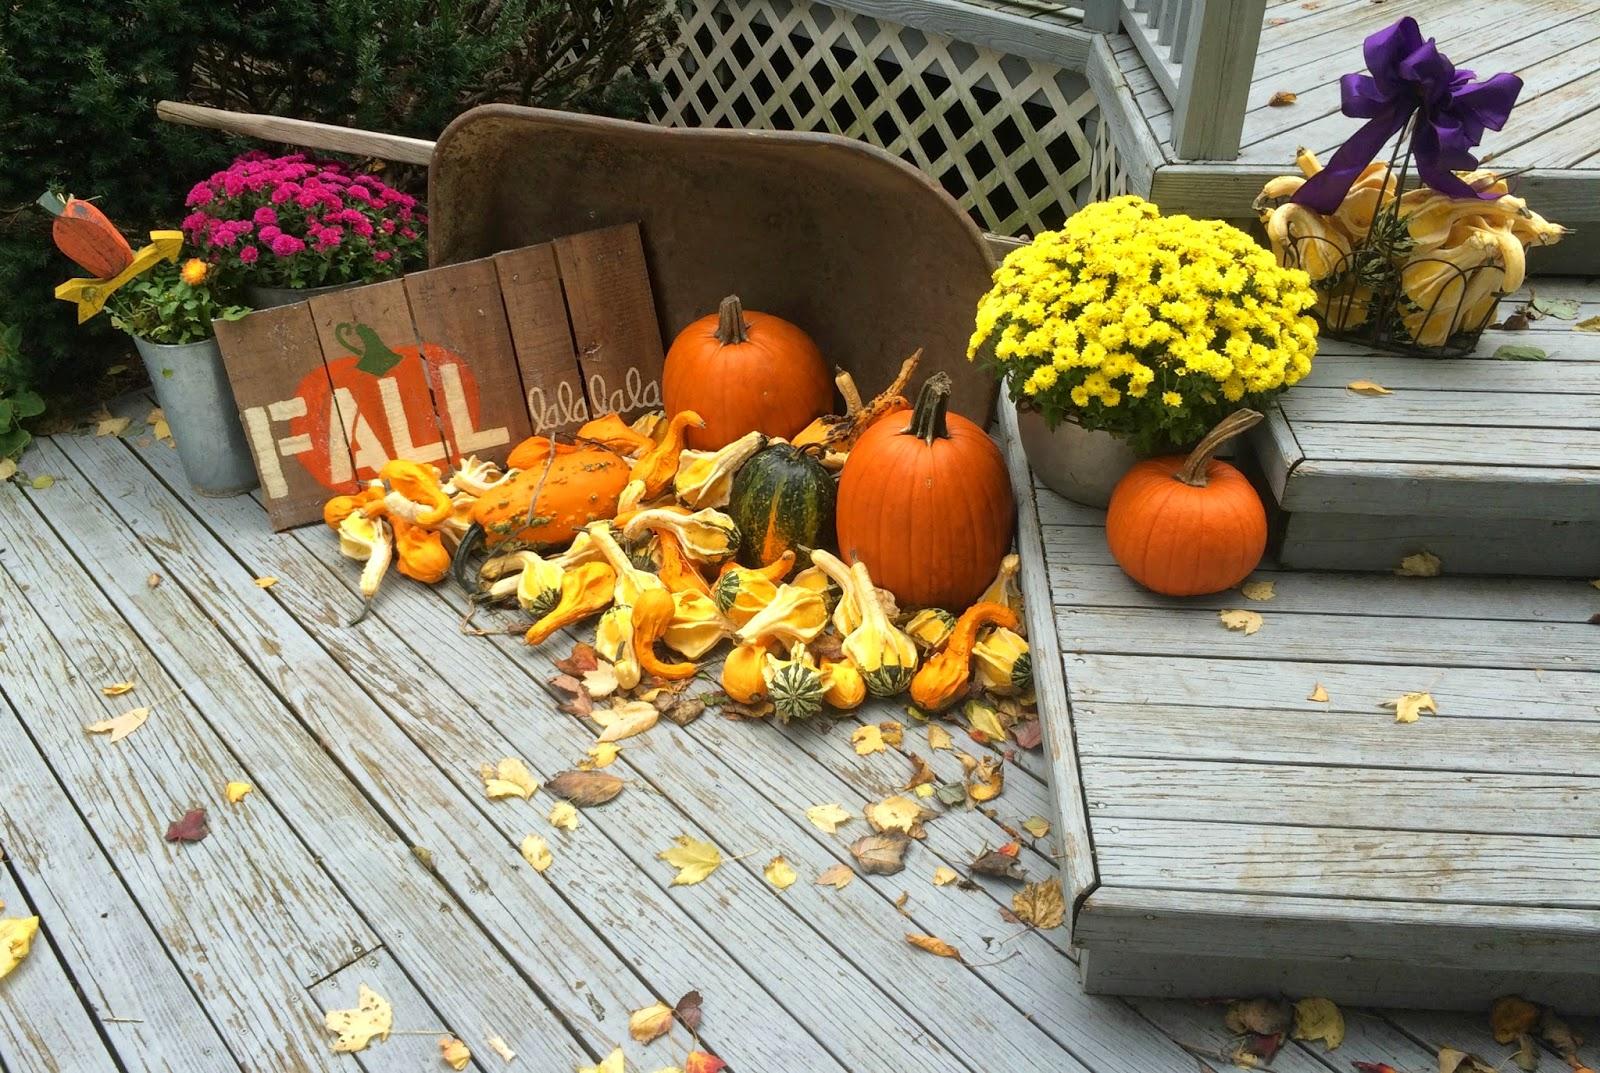 Pumpkin and Gourds in Wheelbarrel